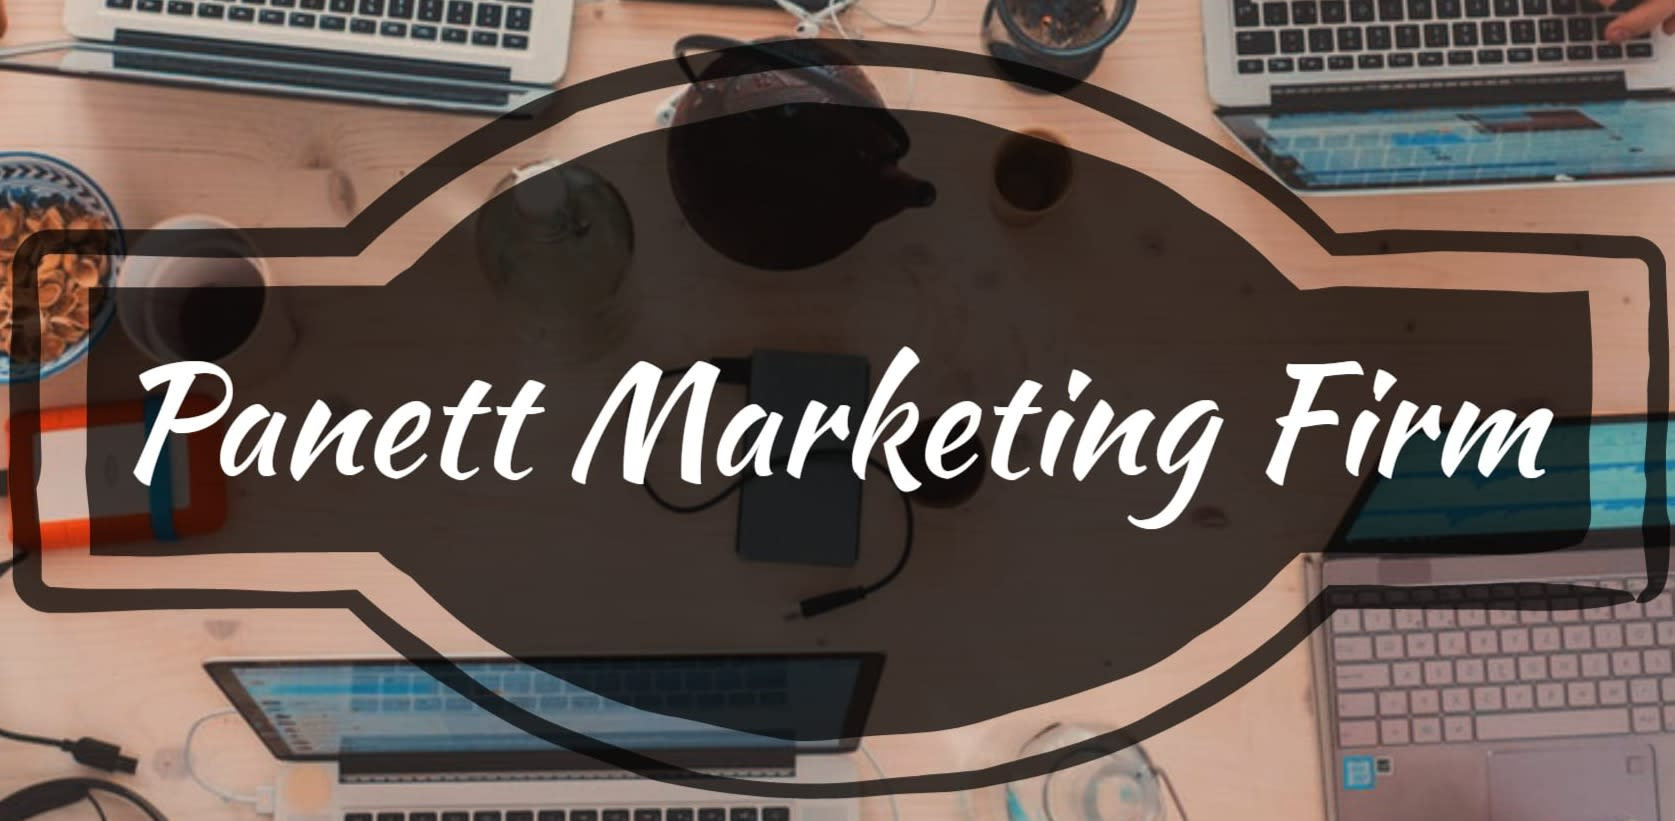 Panett Marketing Firm